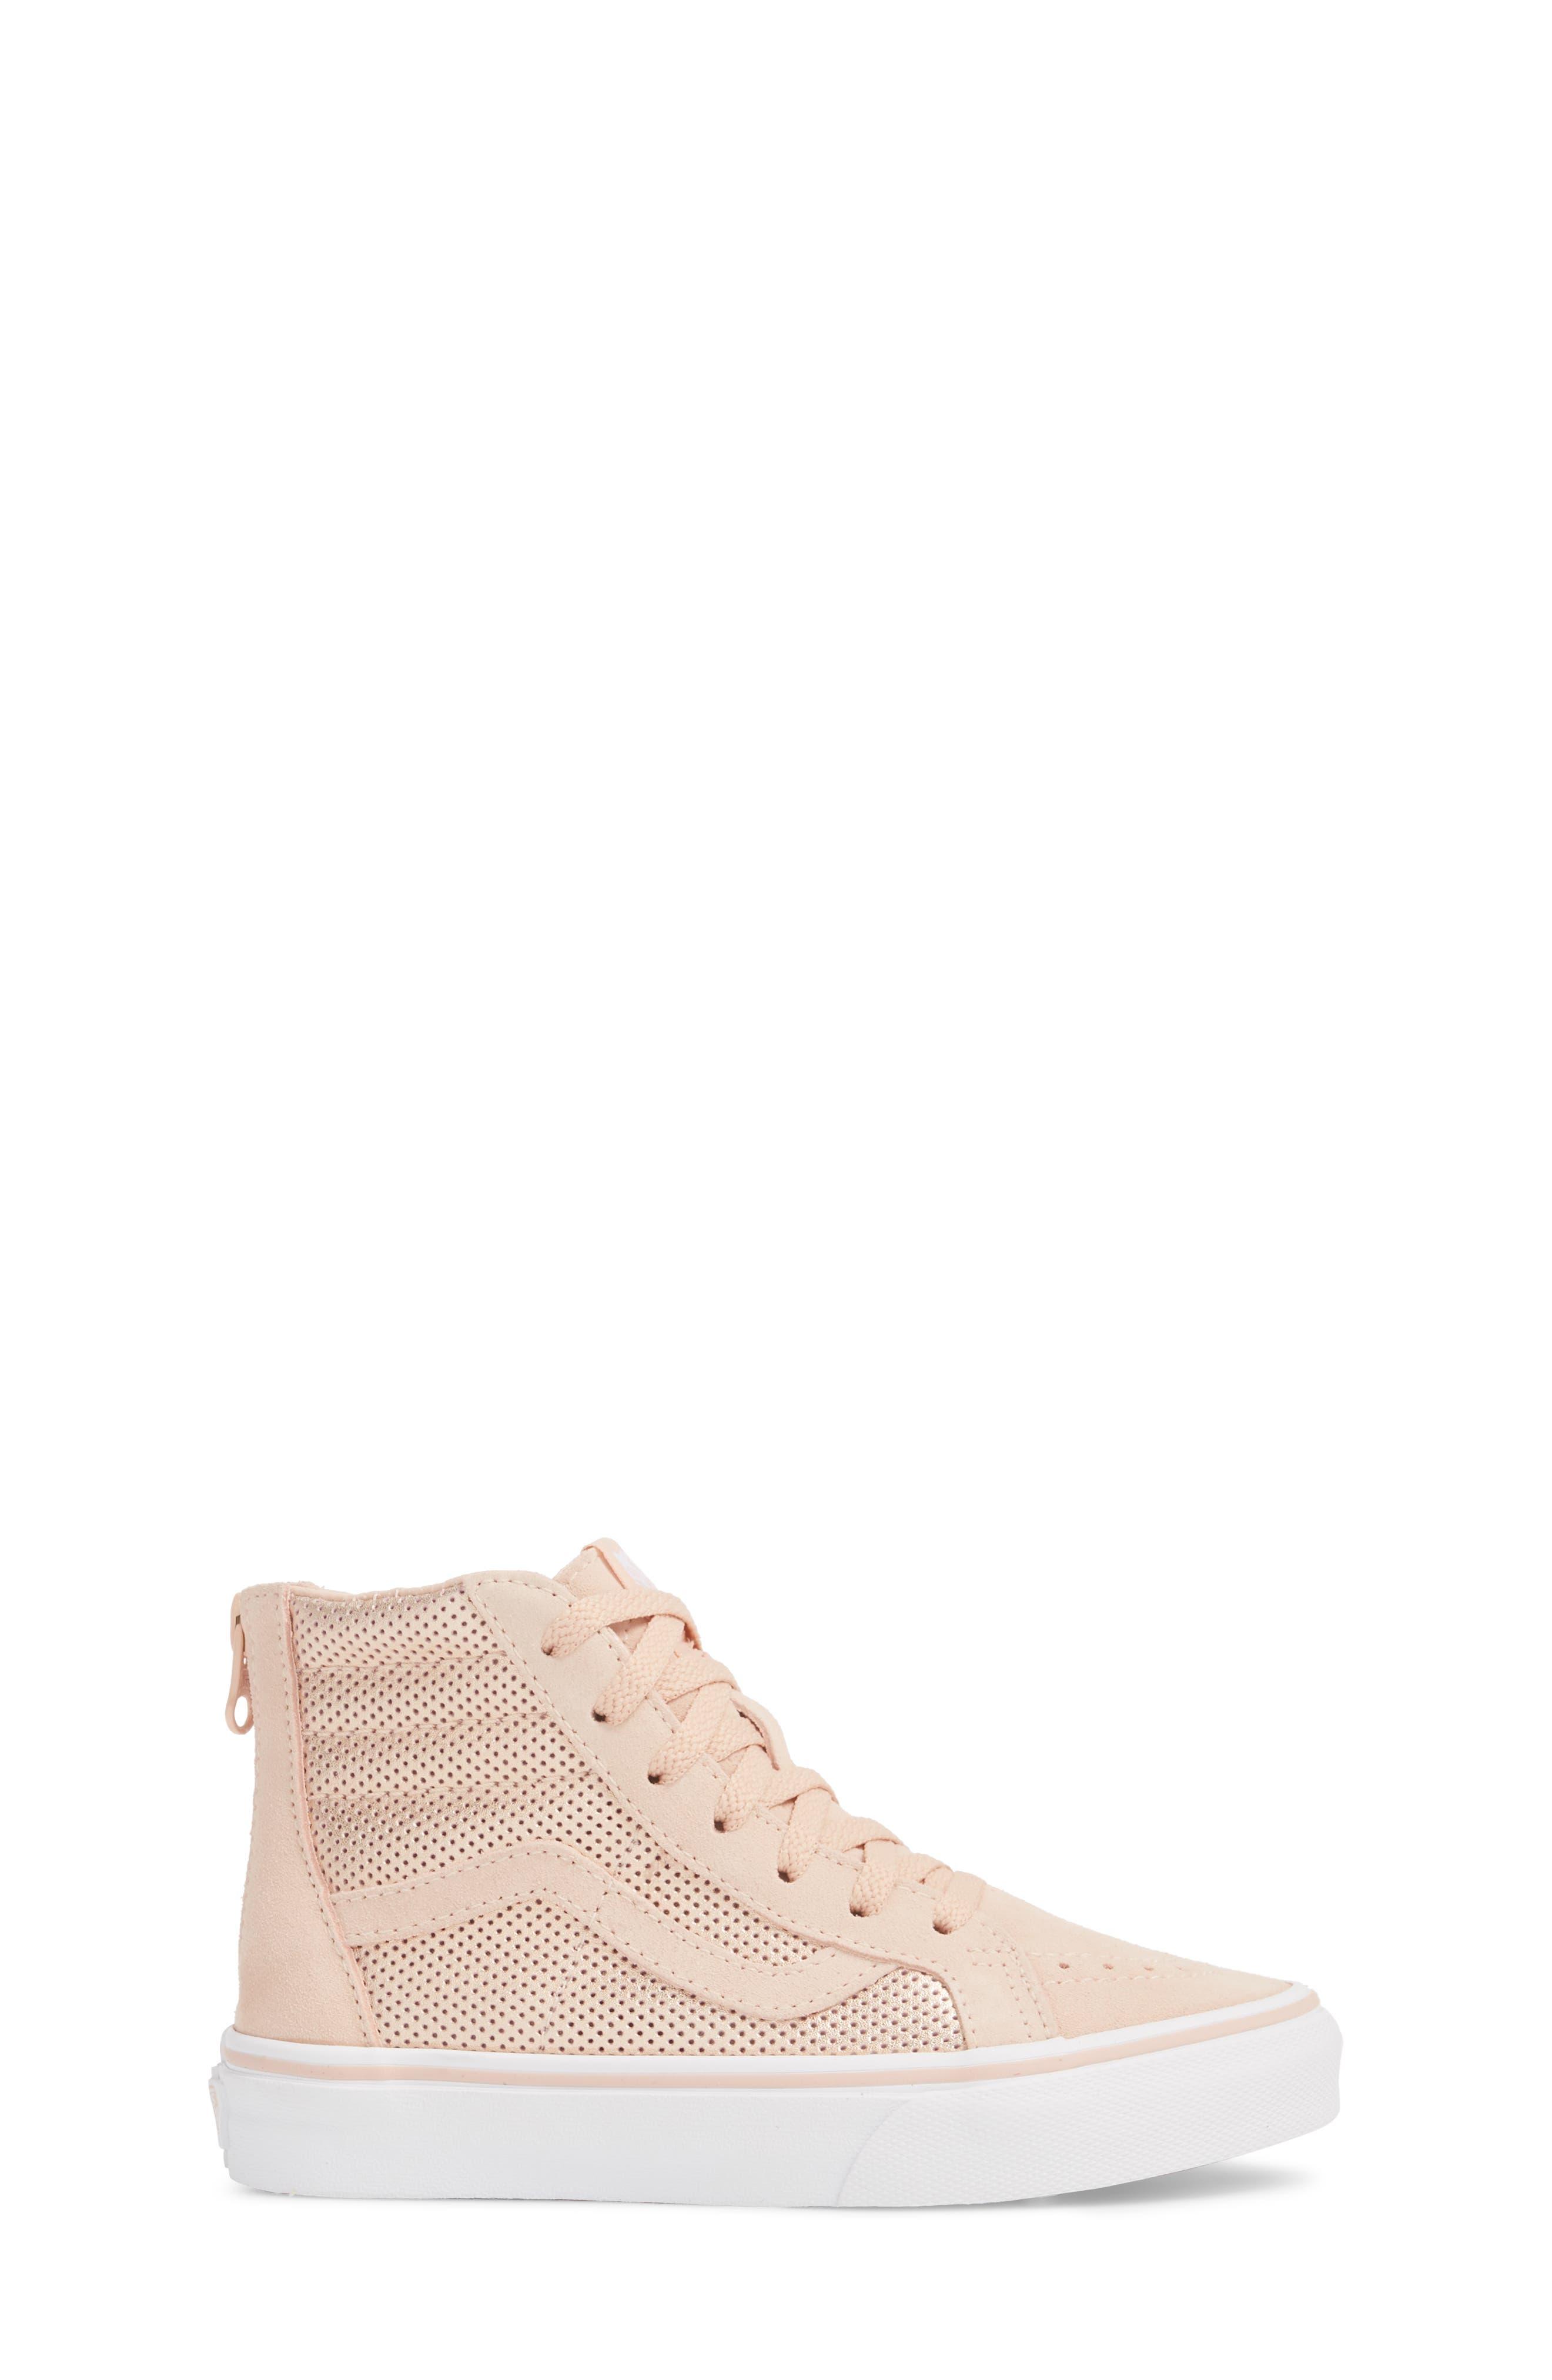 SK8-Hi Zip Sneaker,                             Alternate thumbnail 3, color,                             Rose Gold Suede Leather